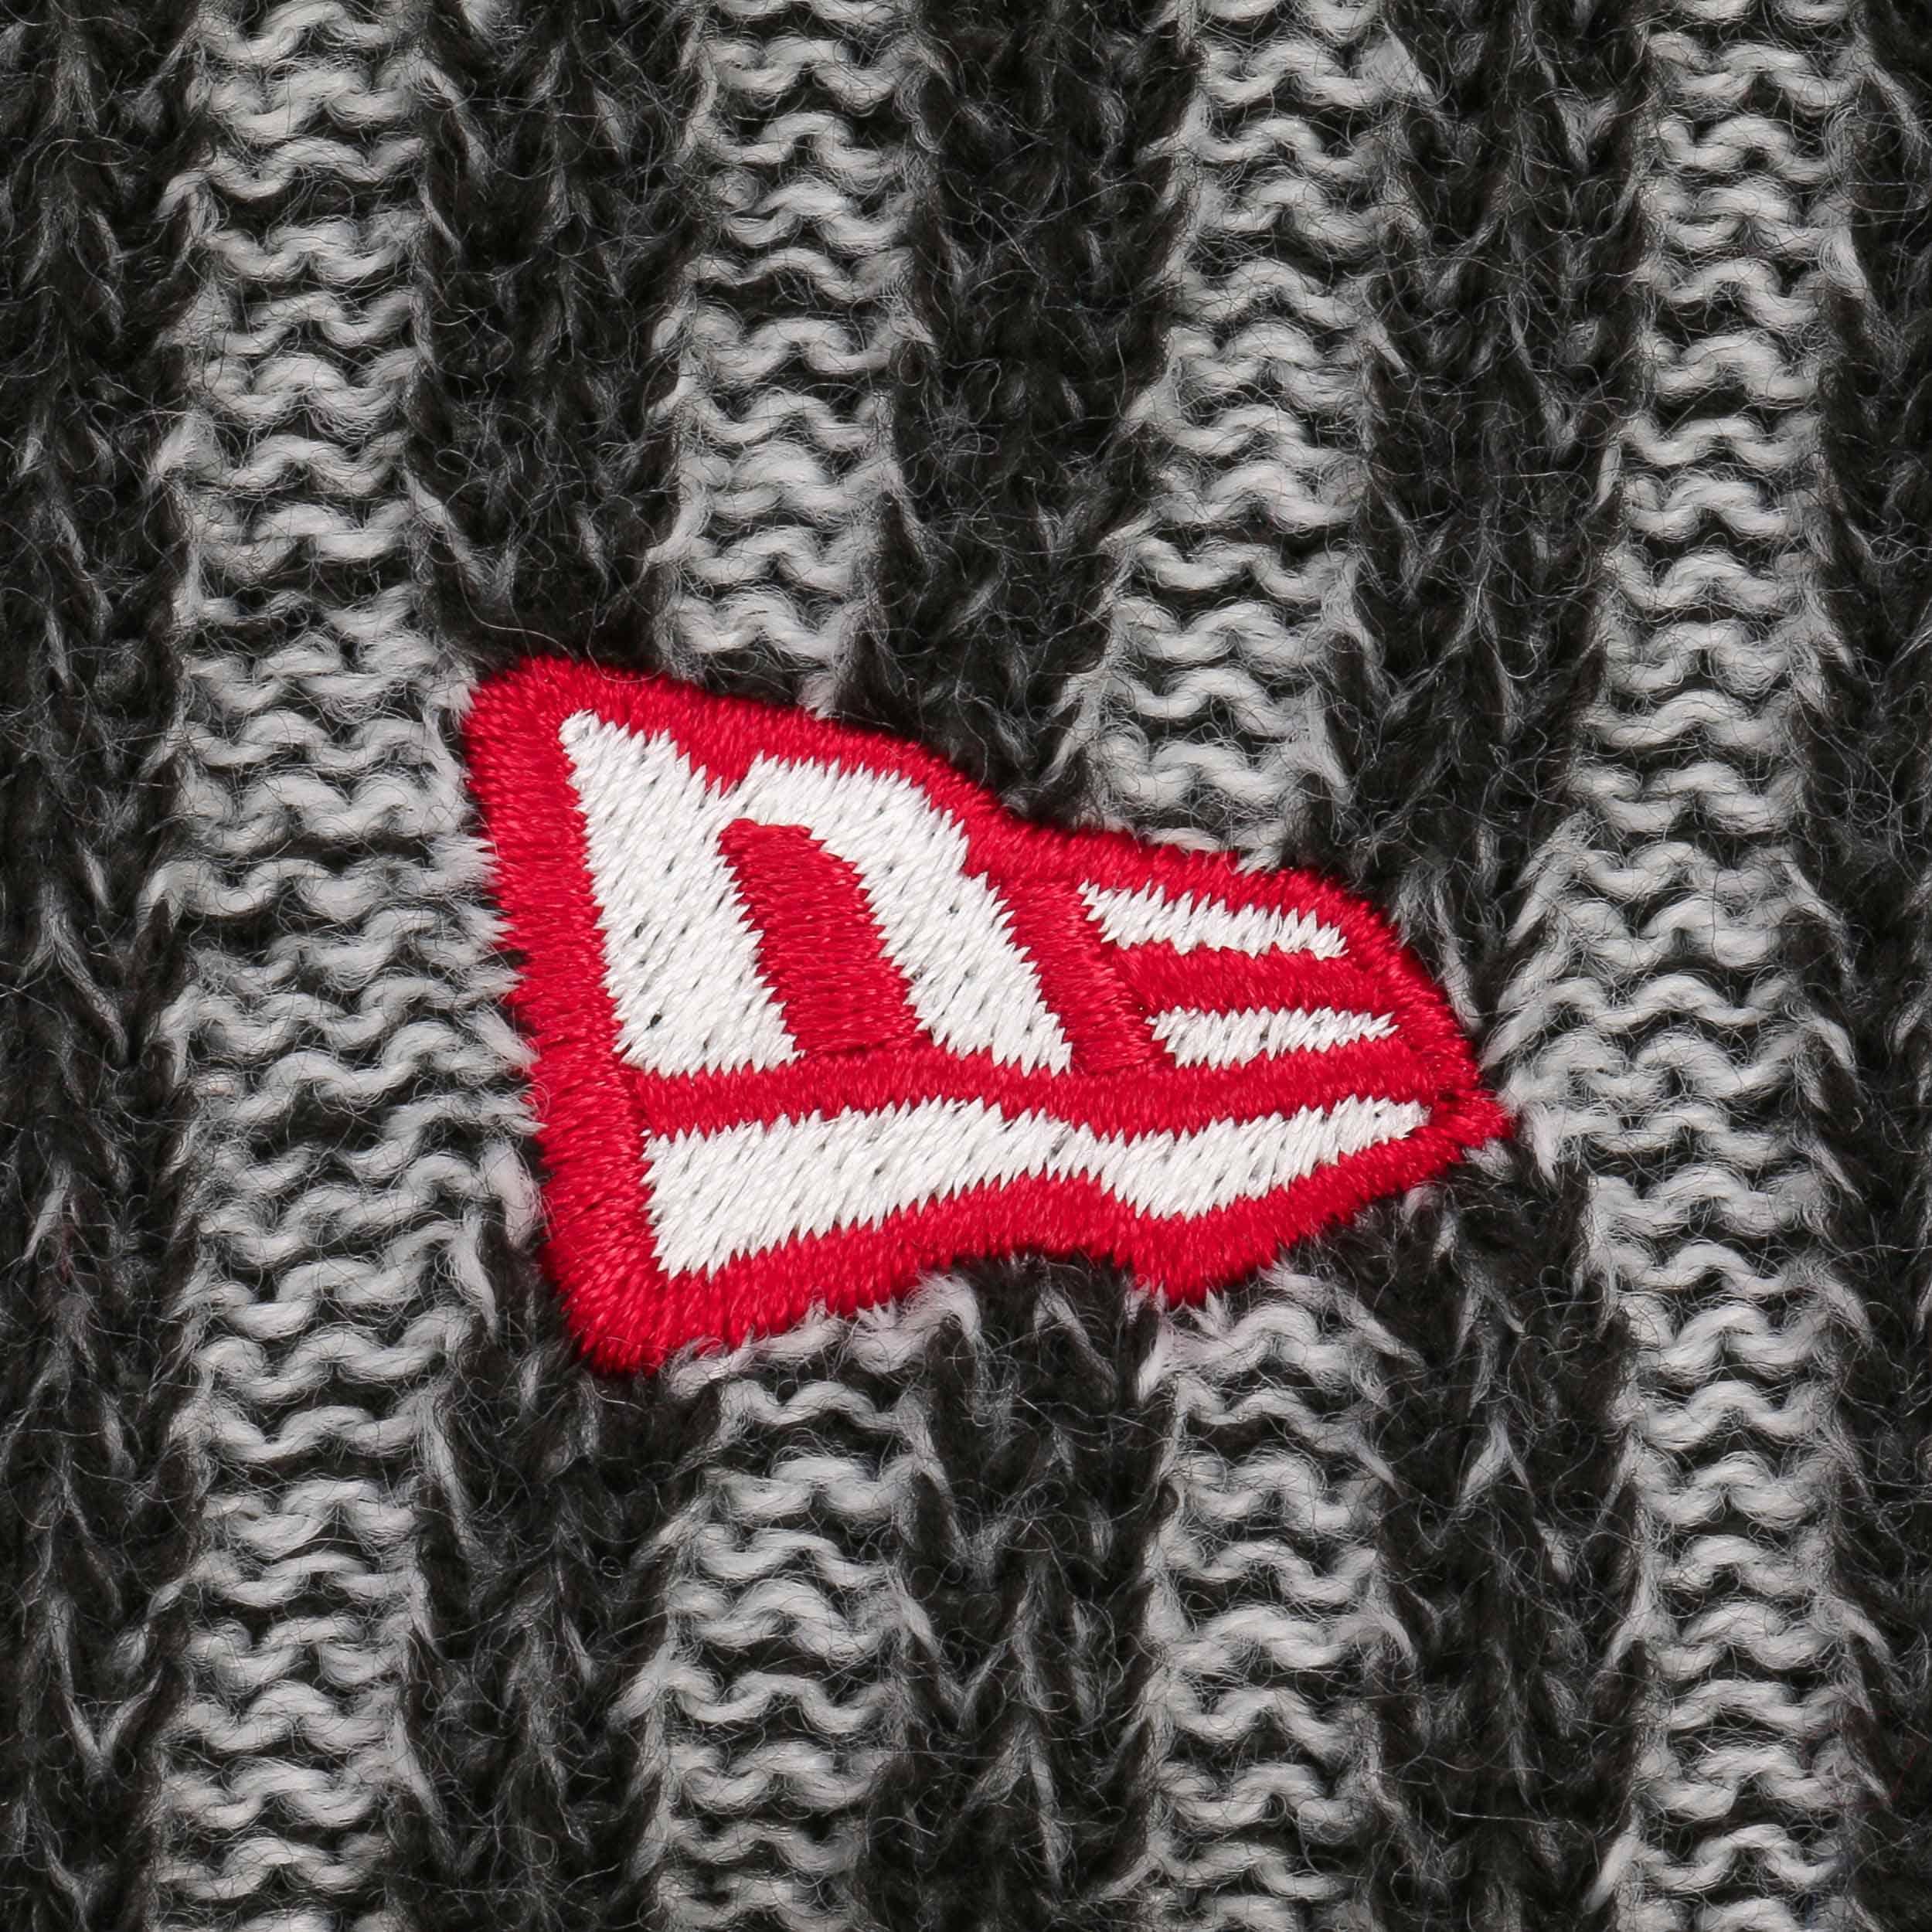 Gorro Beanie NFL Falcons by New Era - Gorros - sombreroshop.es 83cb7ab9a5e